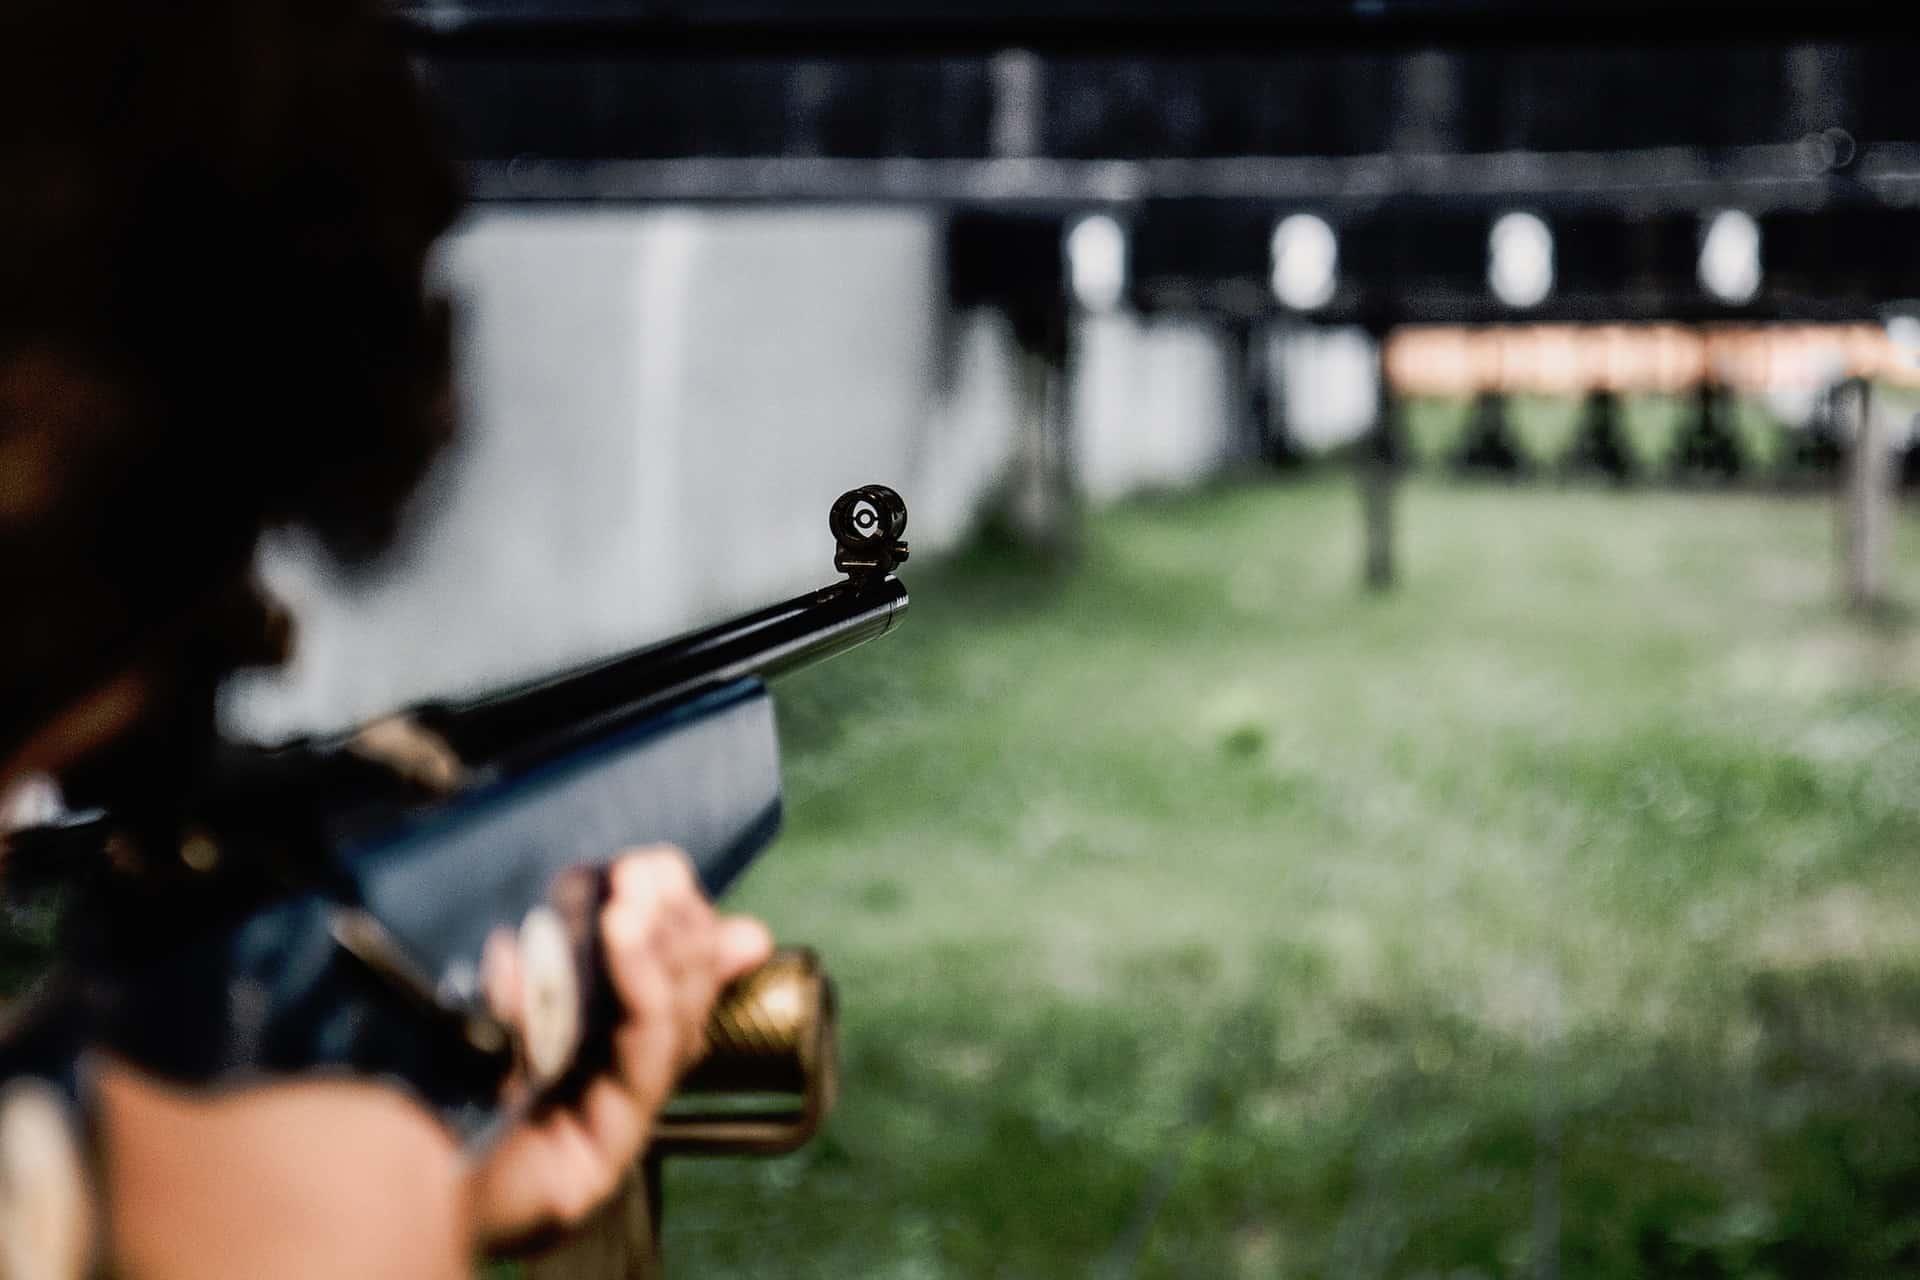 carabina fucile aria compressa